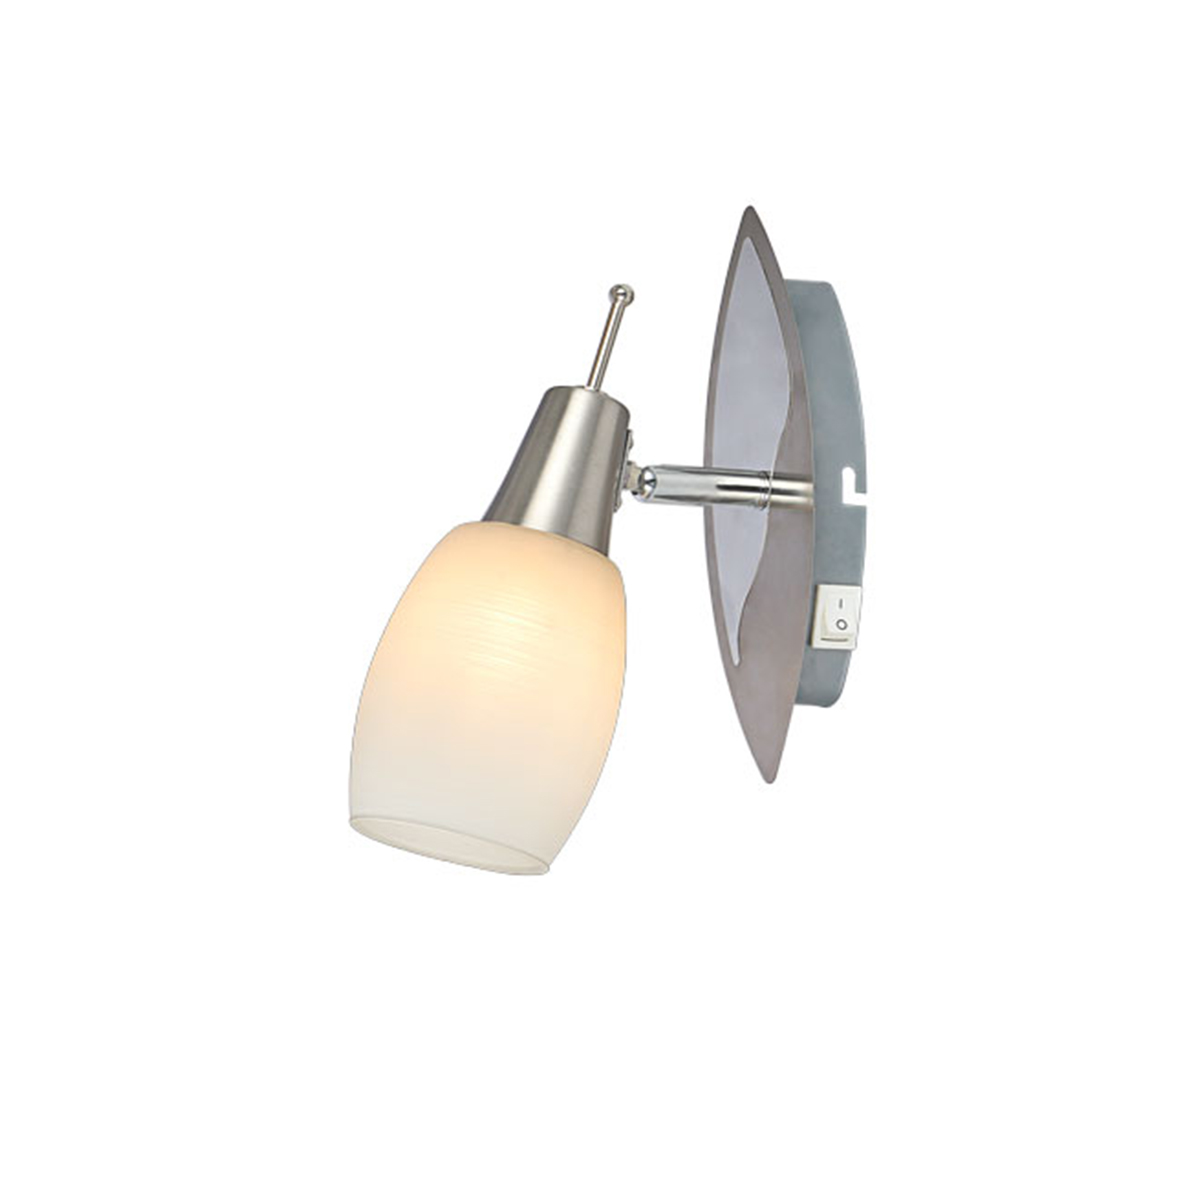 Spot lampa Polaris/1 6602059